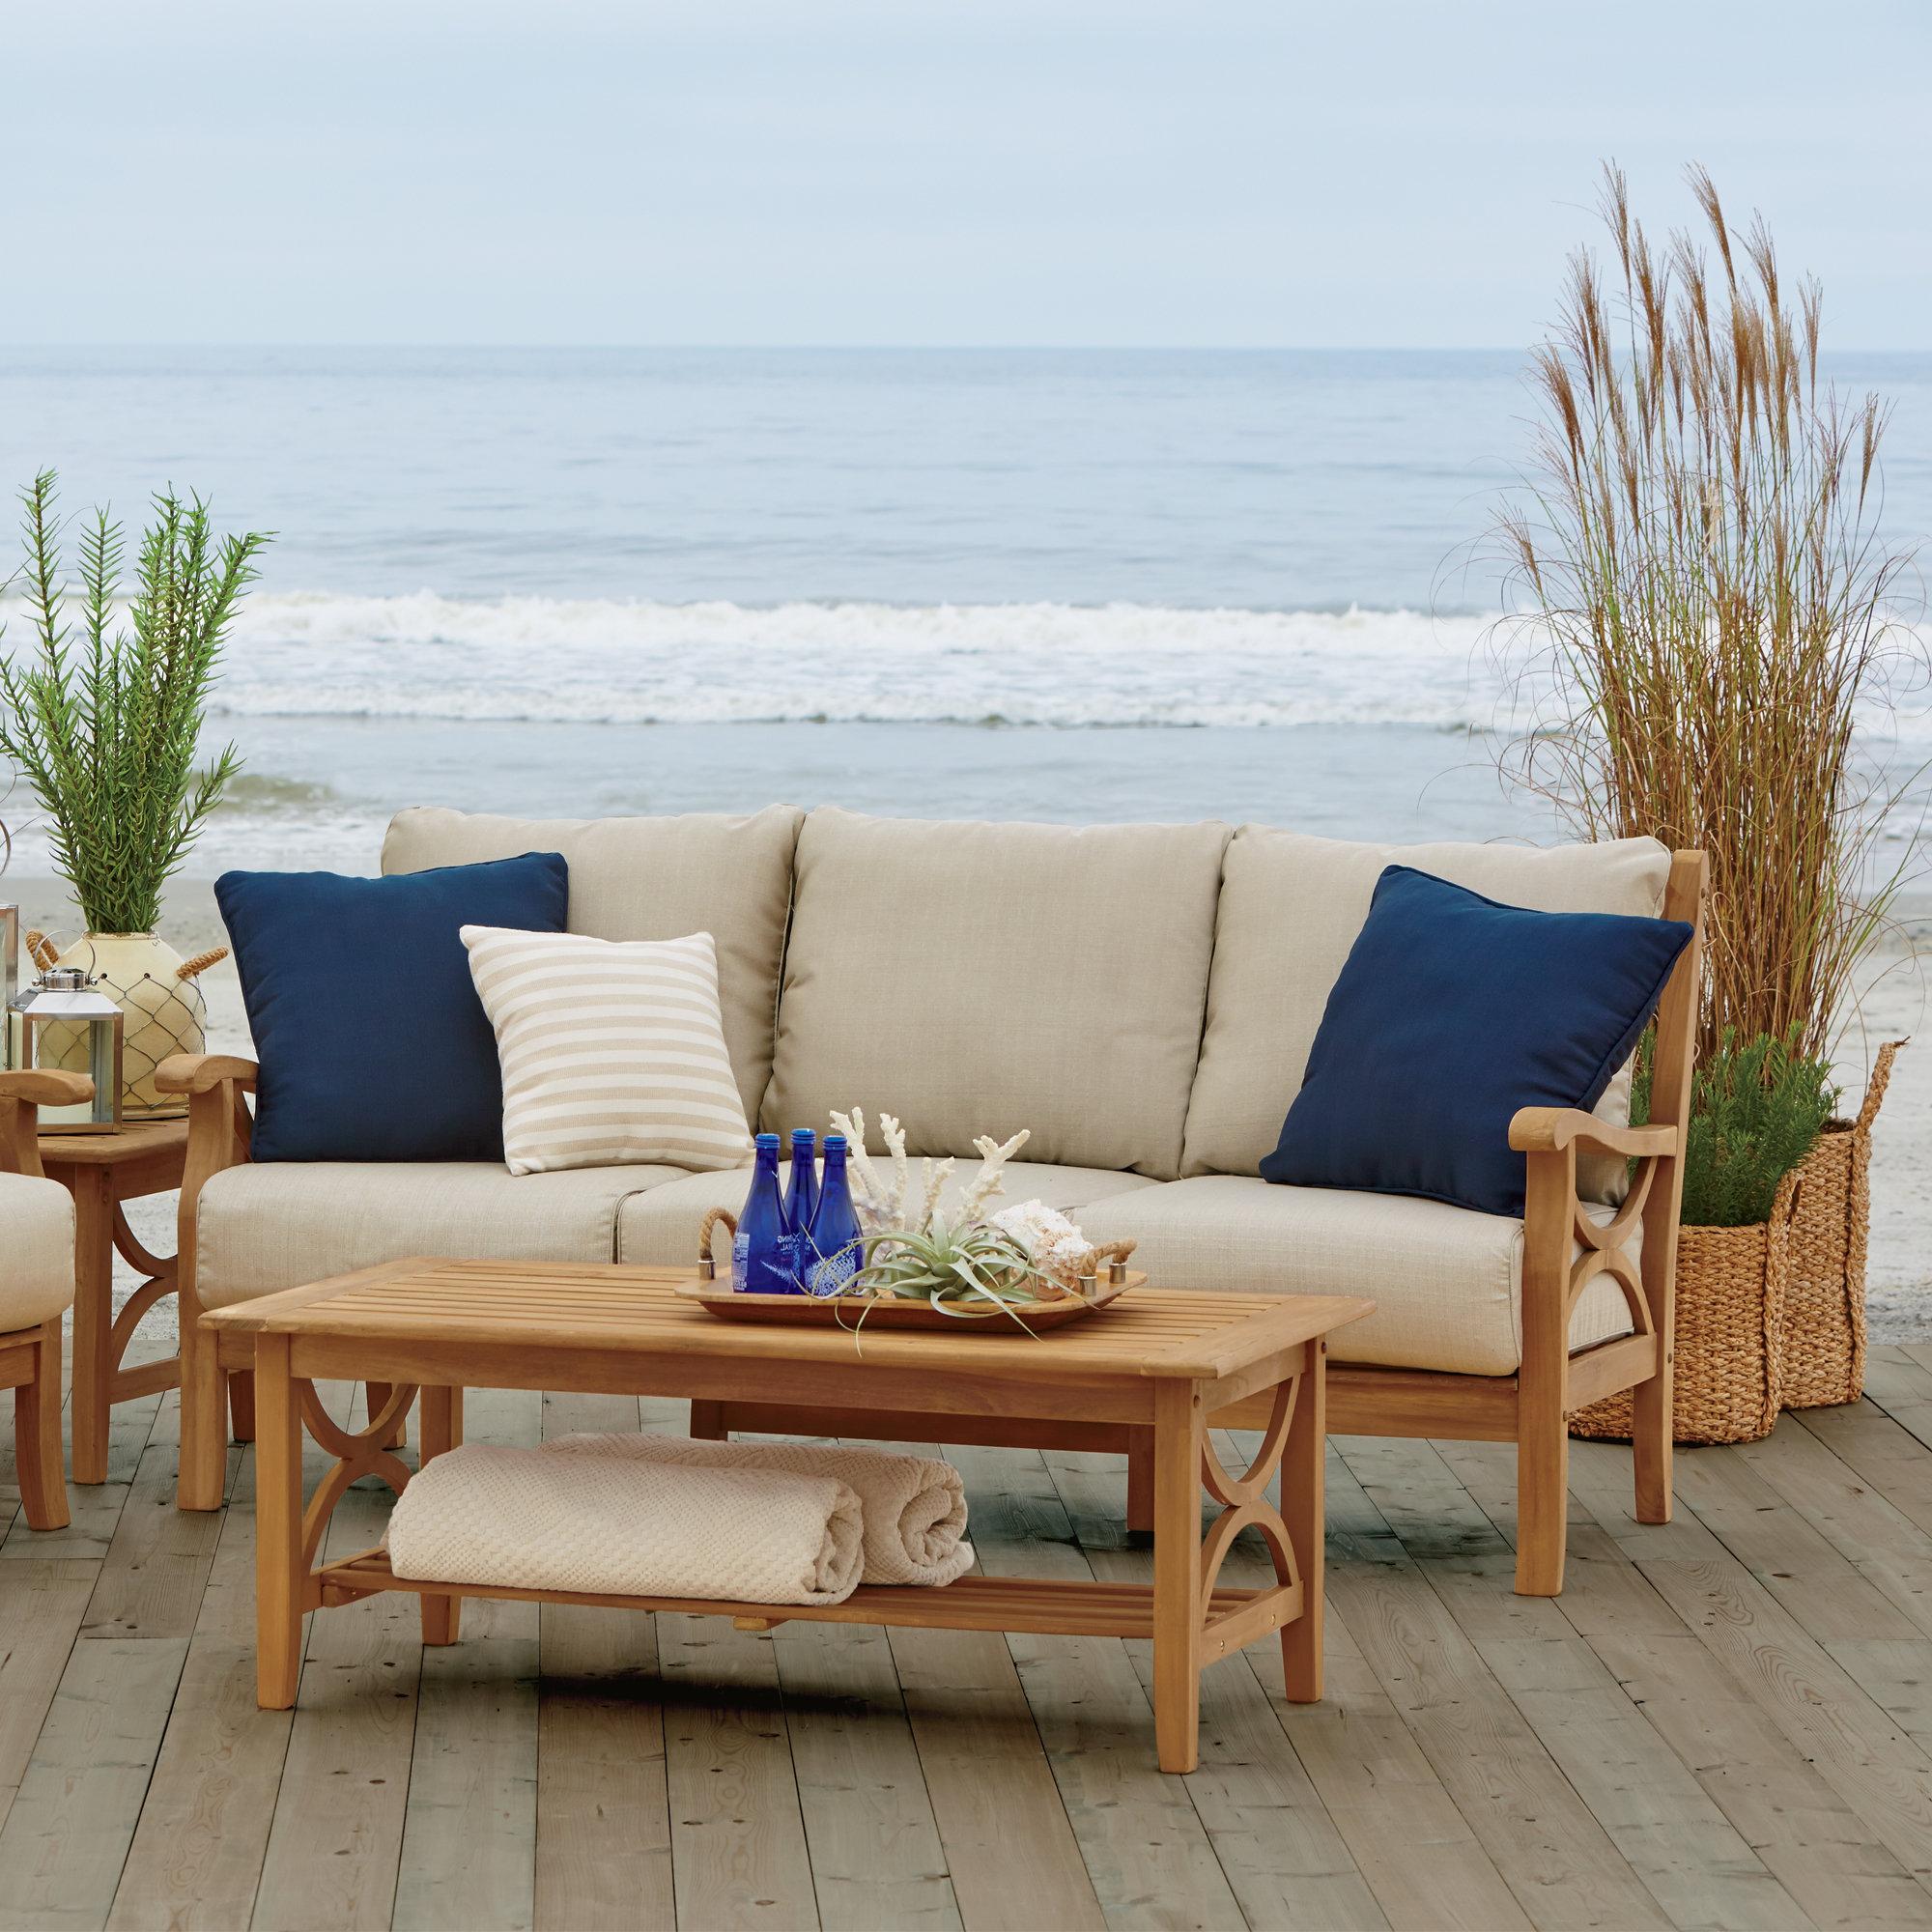 Well Liked Brunswick Teak Patio Sofa With Cushions In Brunswick Teak Loveseats With Cushions (View 20 of 20)